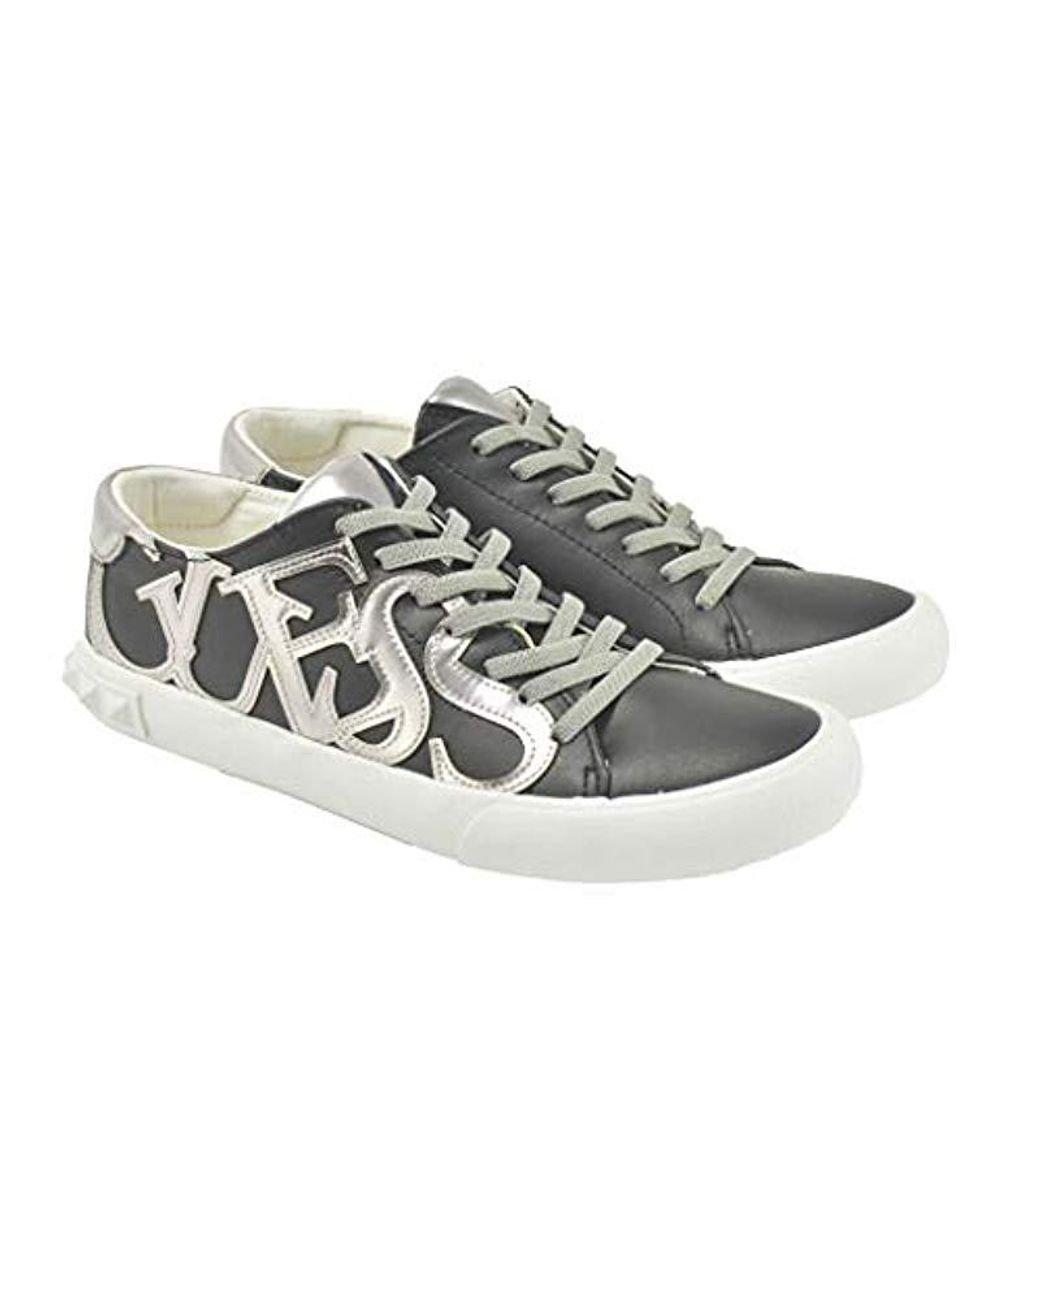 Fl5hamele12 Femme 37 Sneakers Guess Noir doWCBrxe